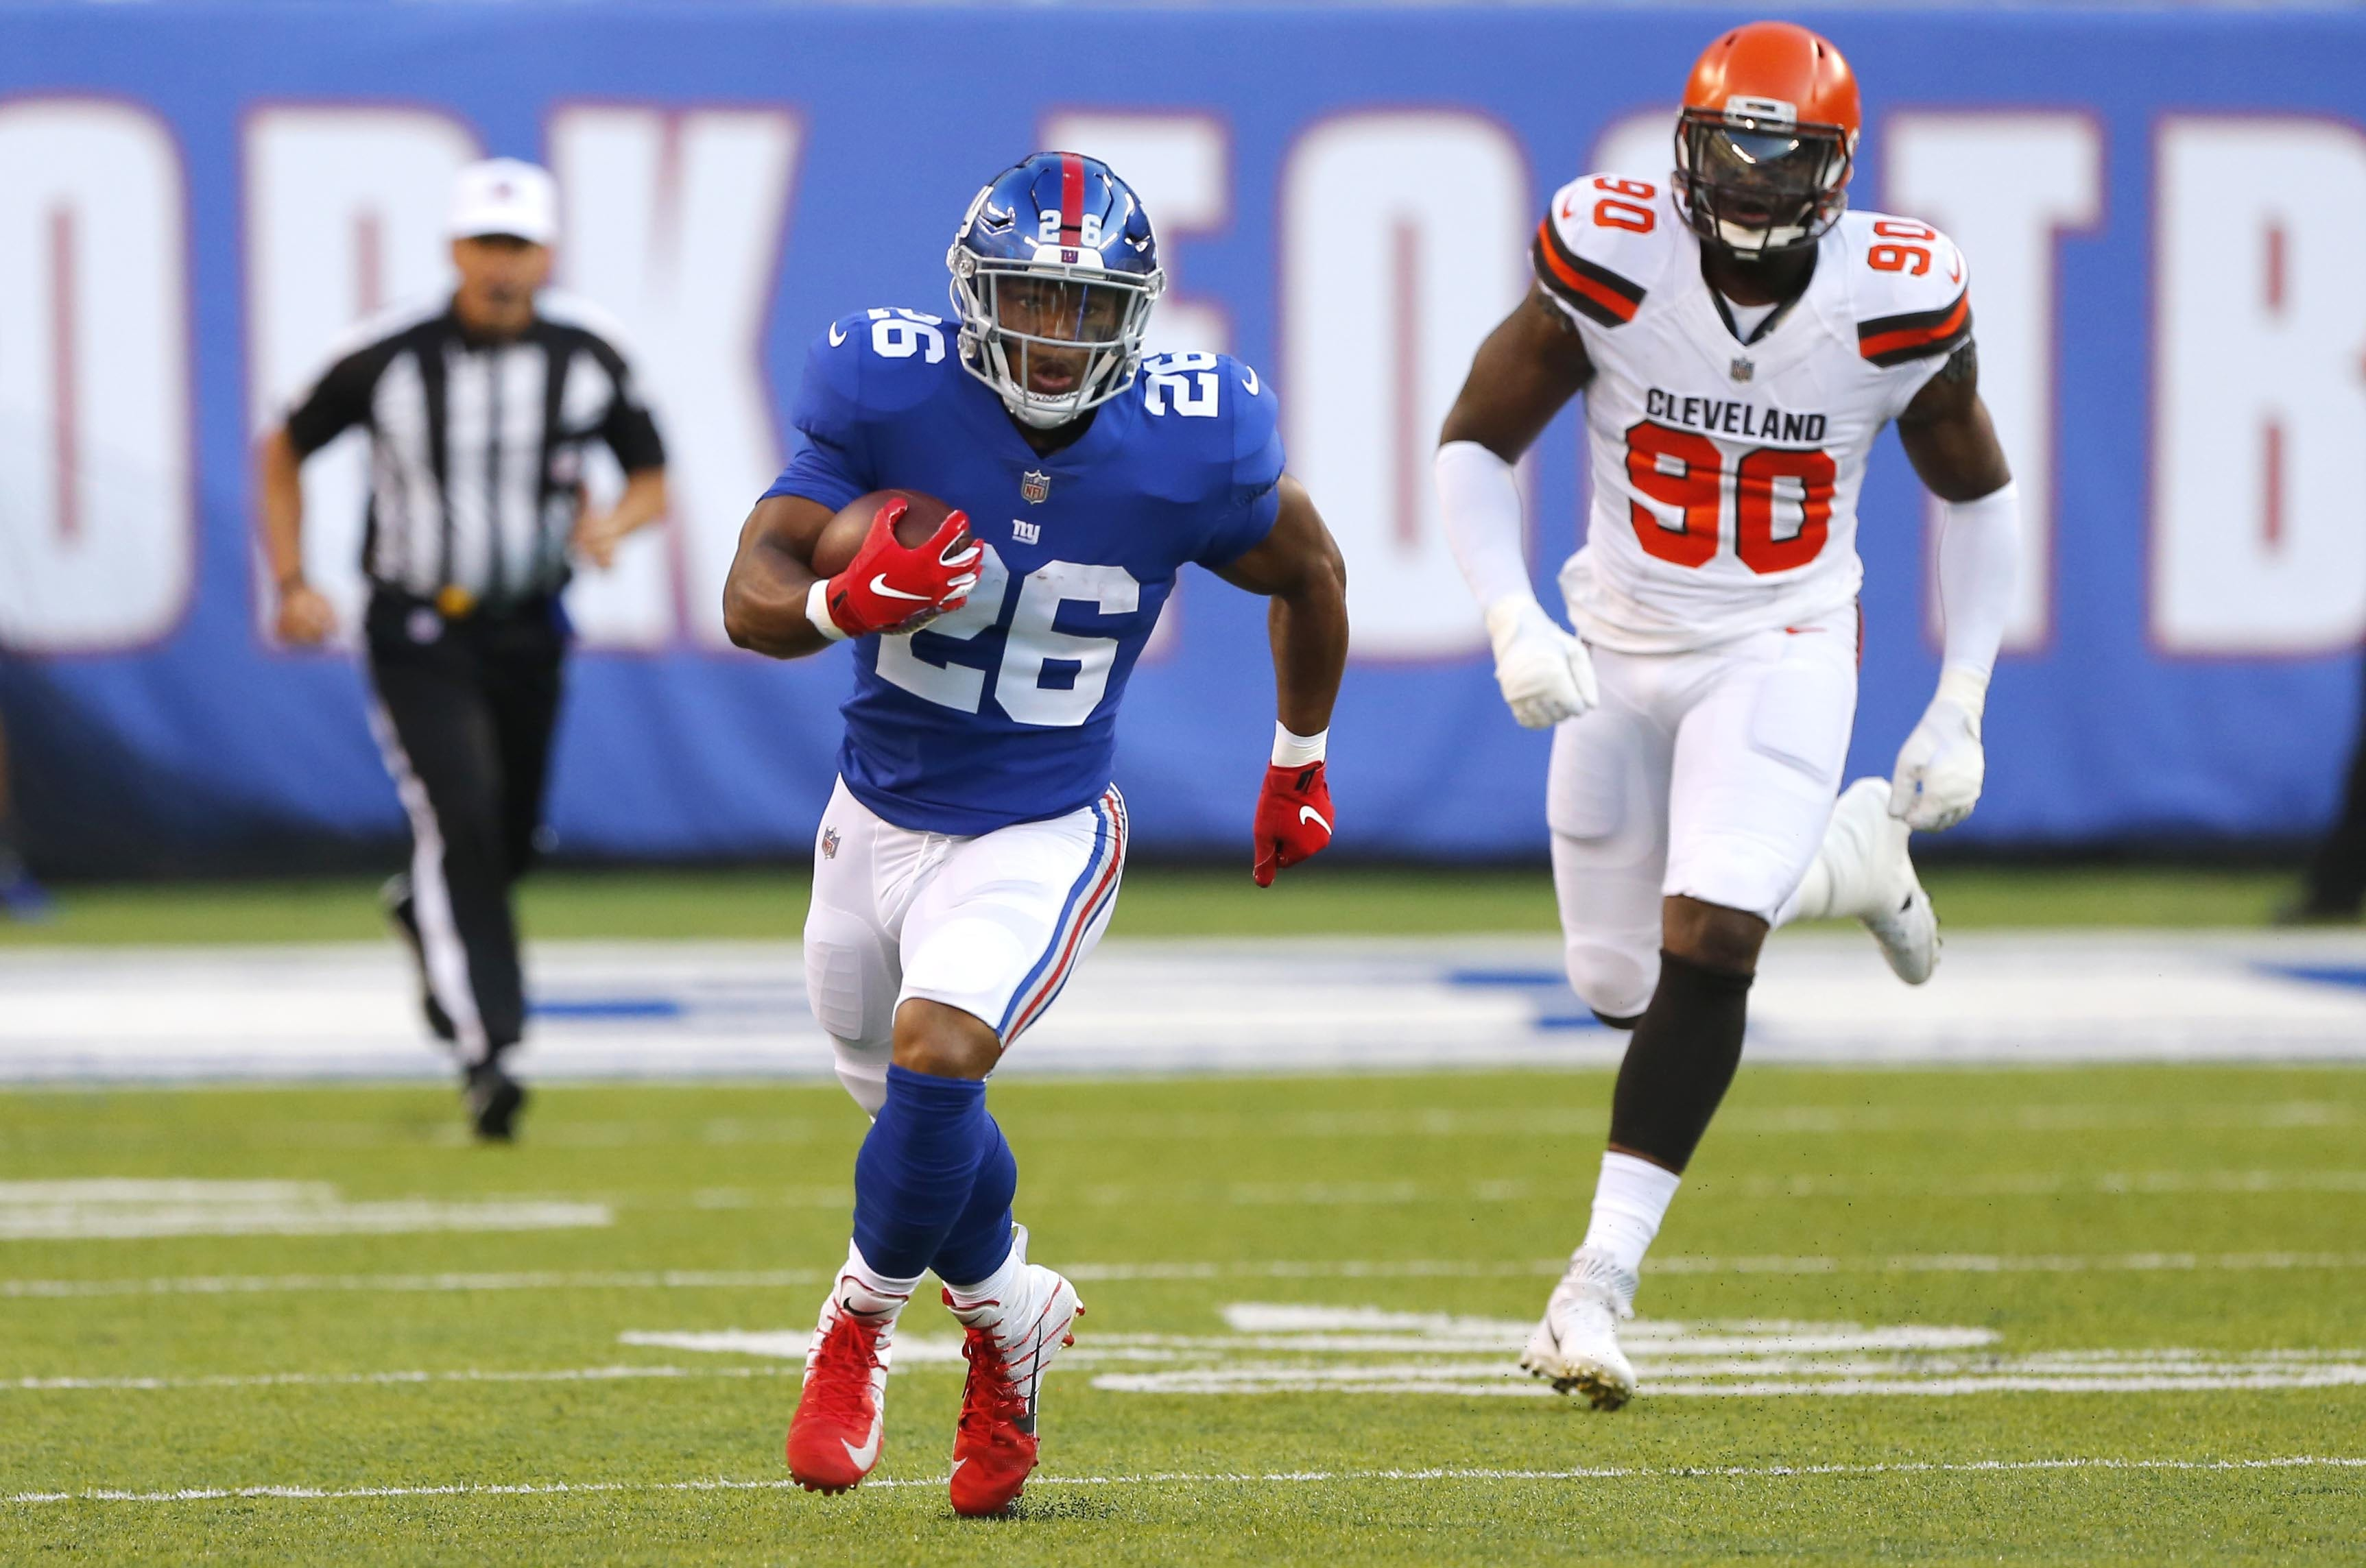 ec90b9a2ea2 New York Giants  Saquon Barkley s Injury Timetable